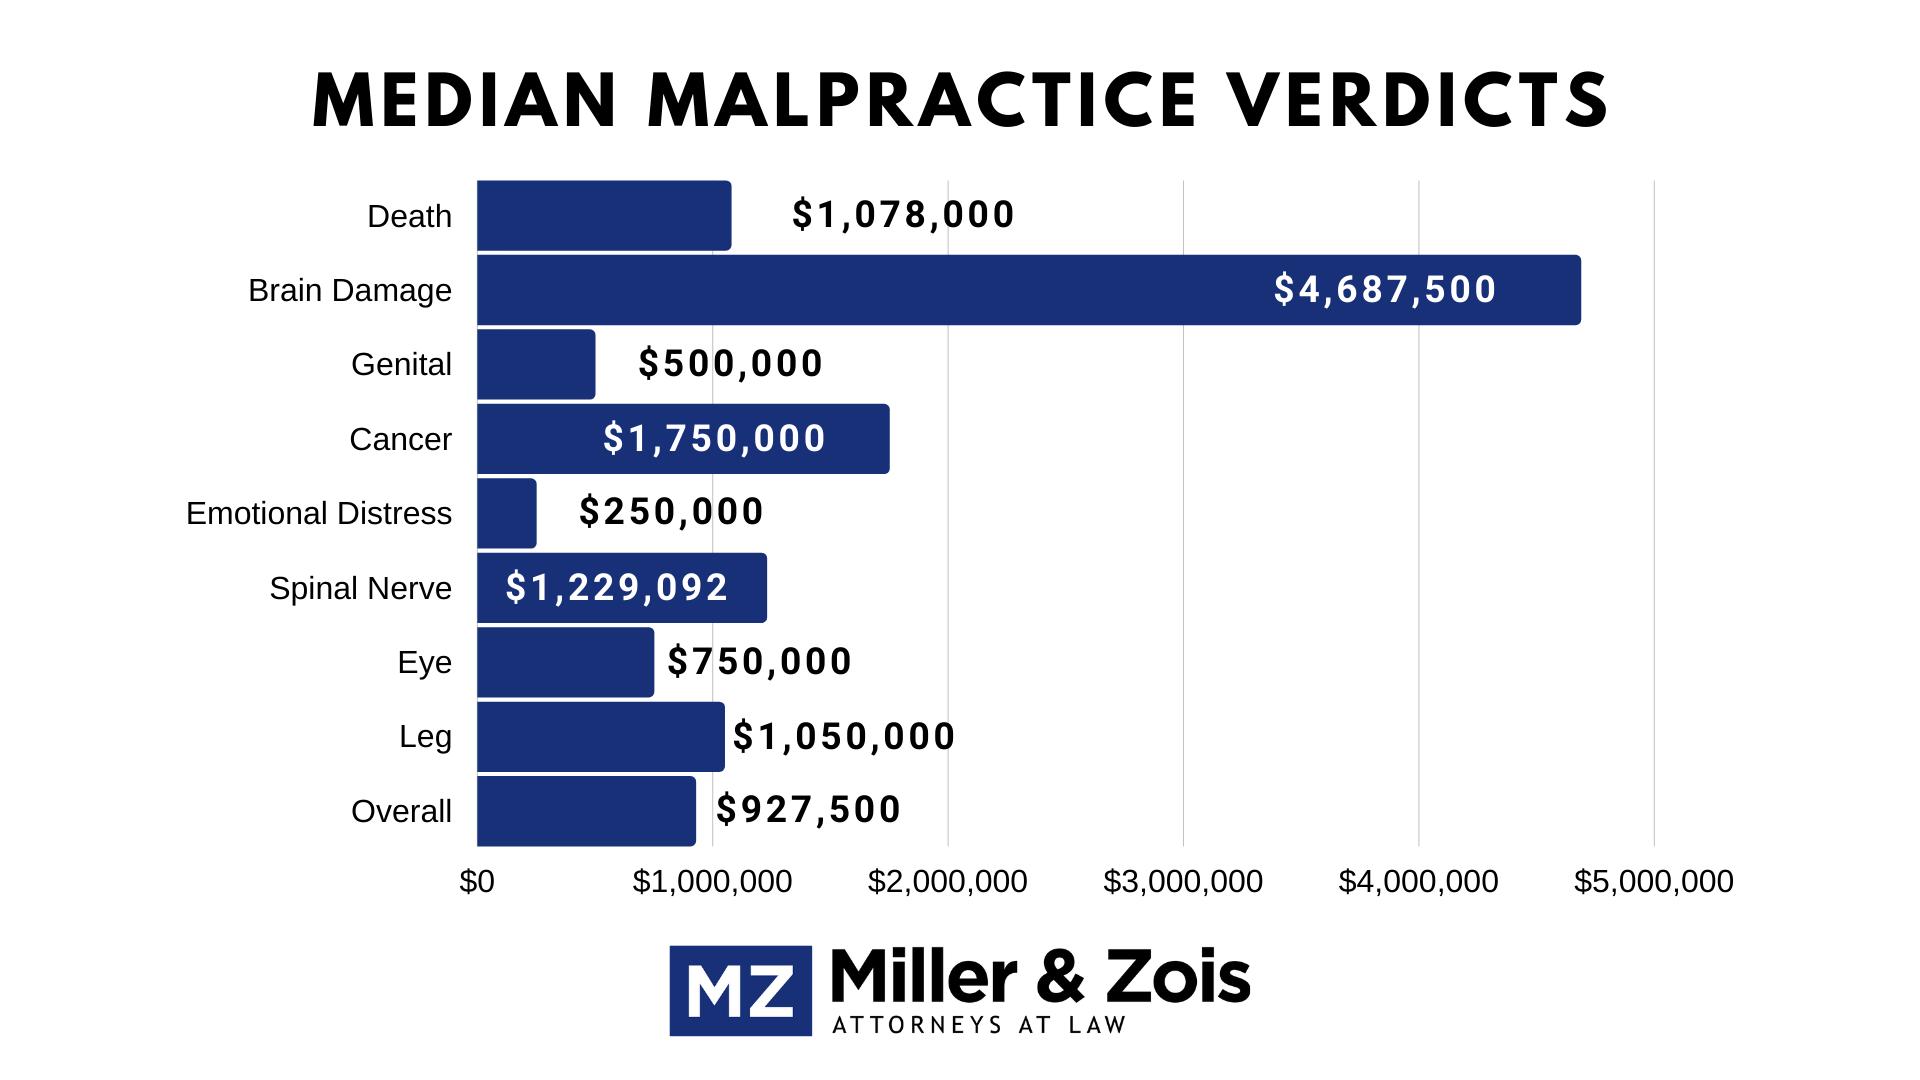 Median Medical Malpractice Verdicts